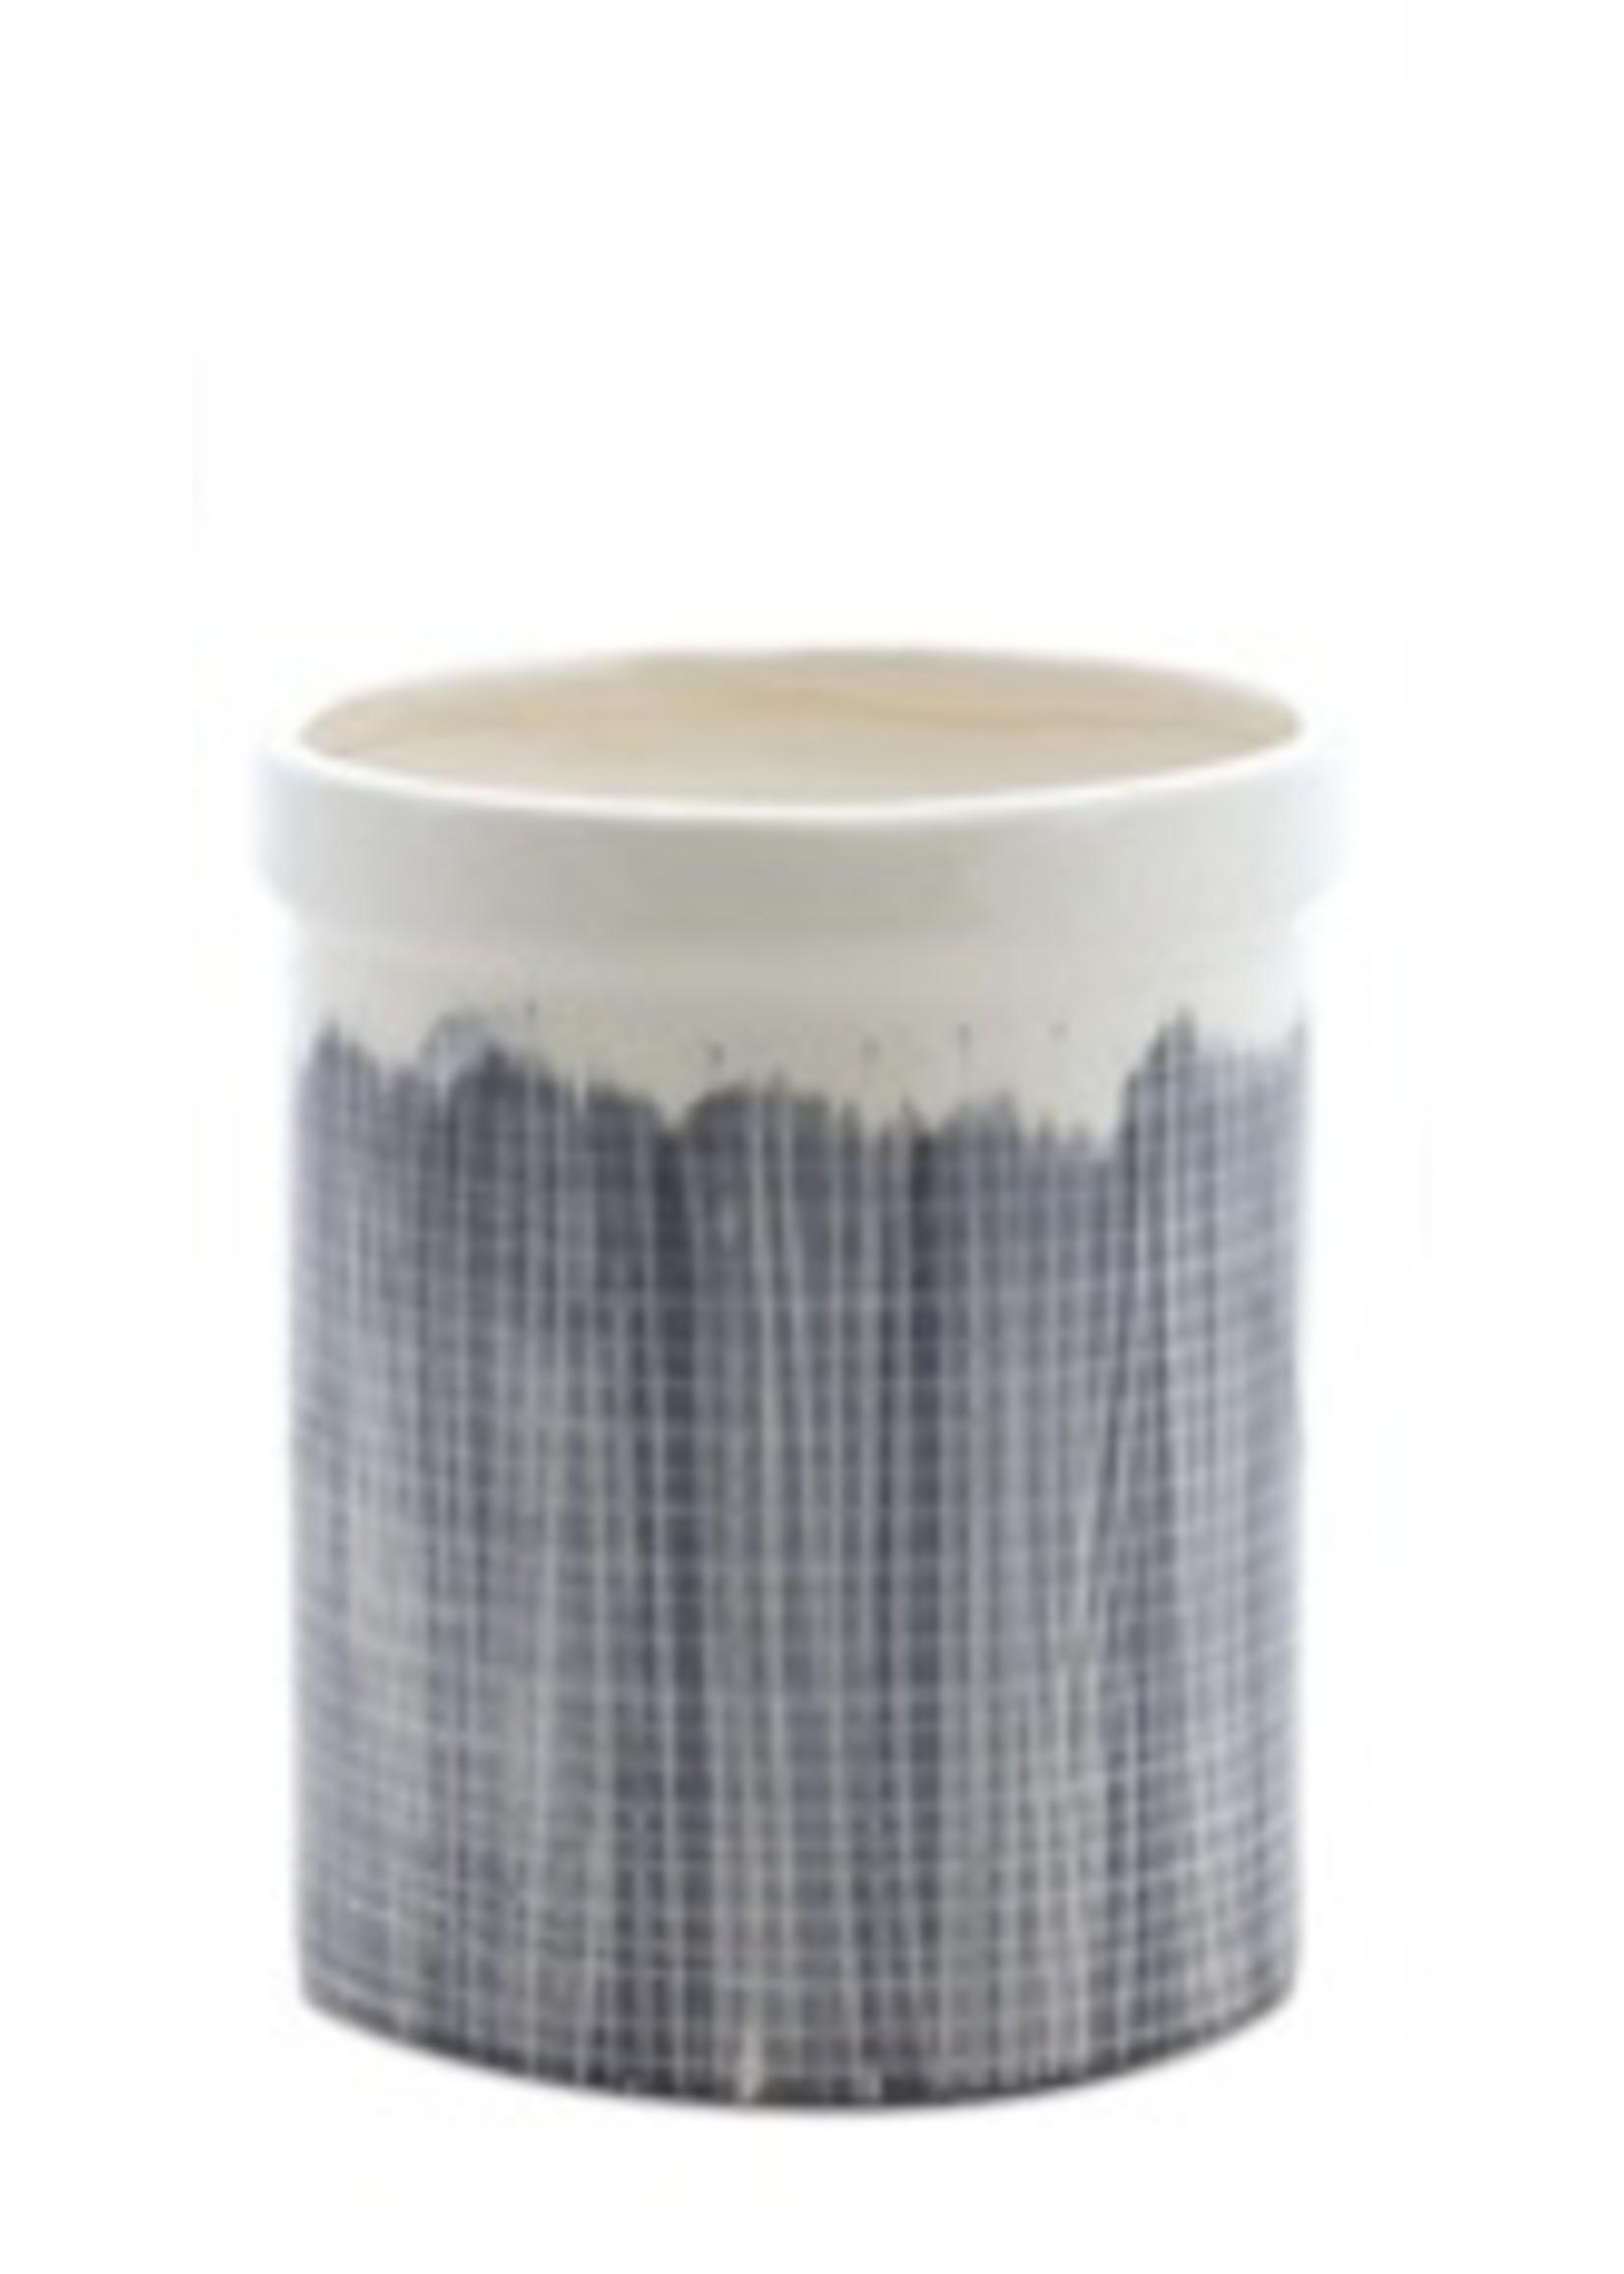 melrose Blue & White Glaze Crock Medium